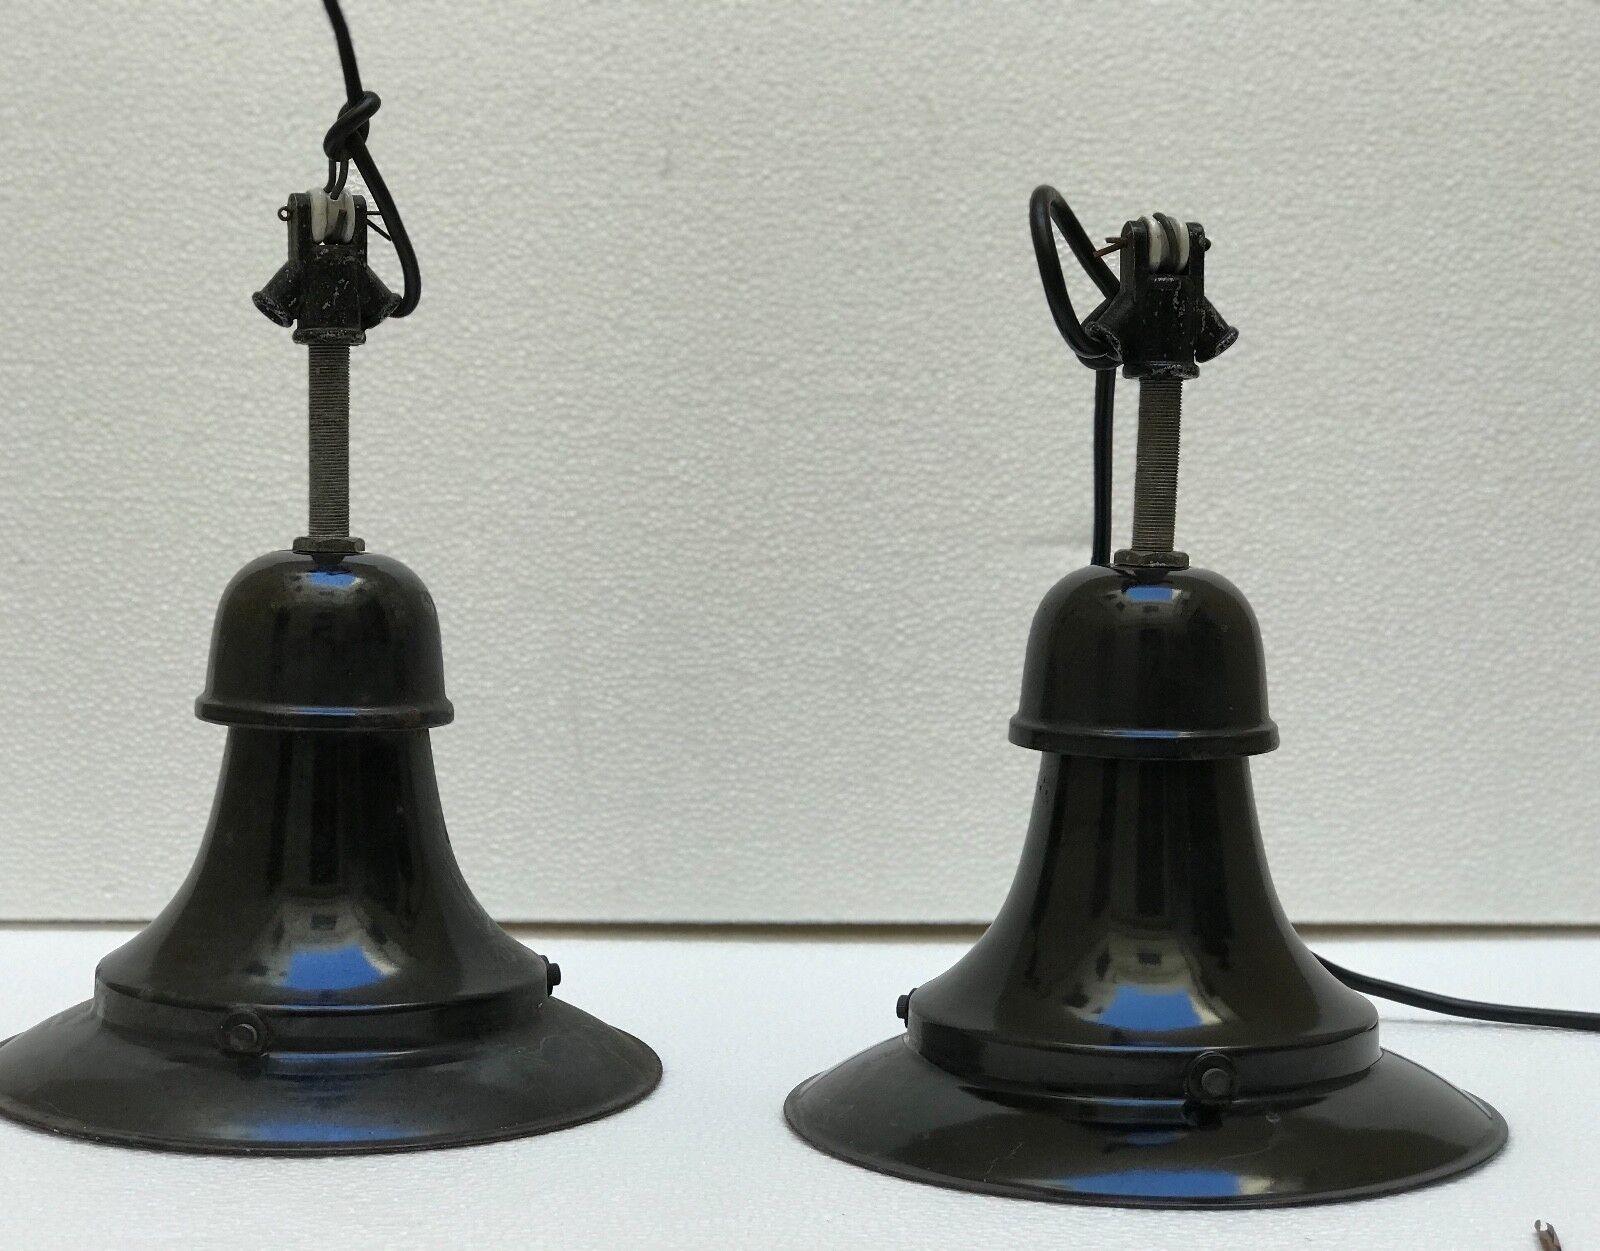 MUSEAL HISTORICAL LAMP design industrial Kandem BAUHAUS CRHISTIAN DELL KAISER